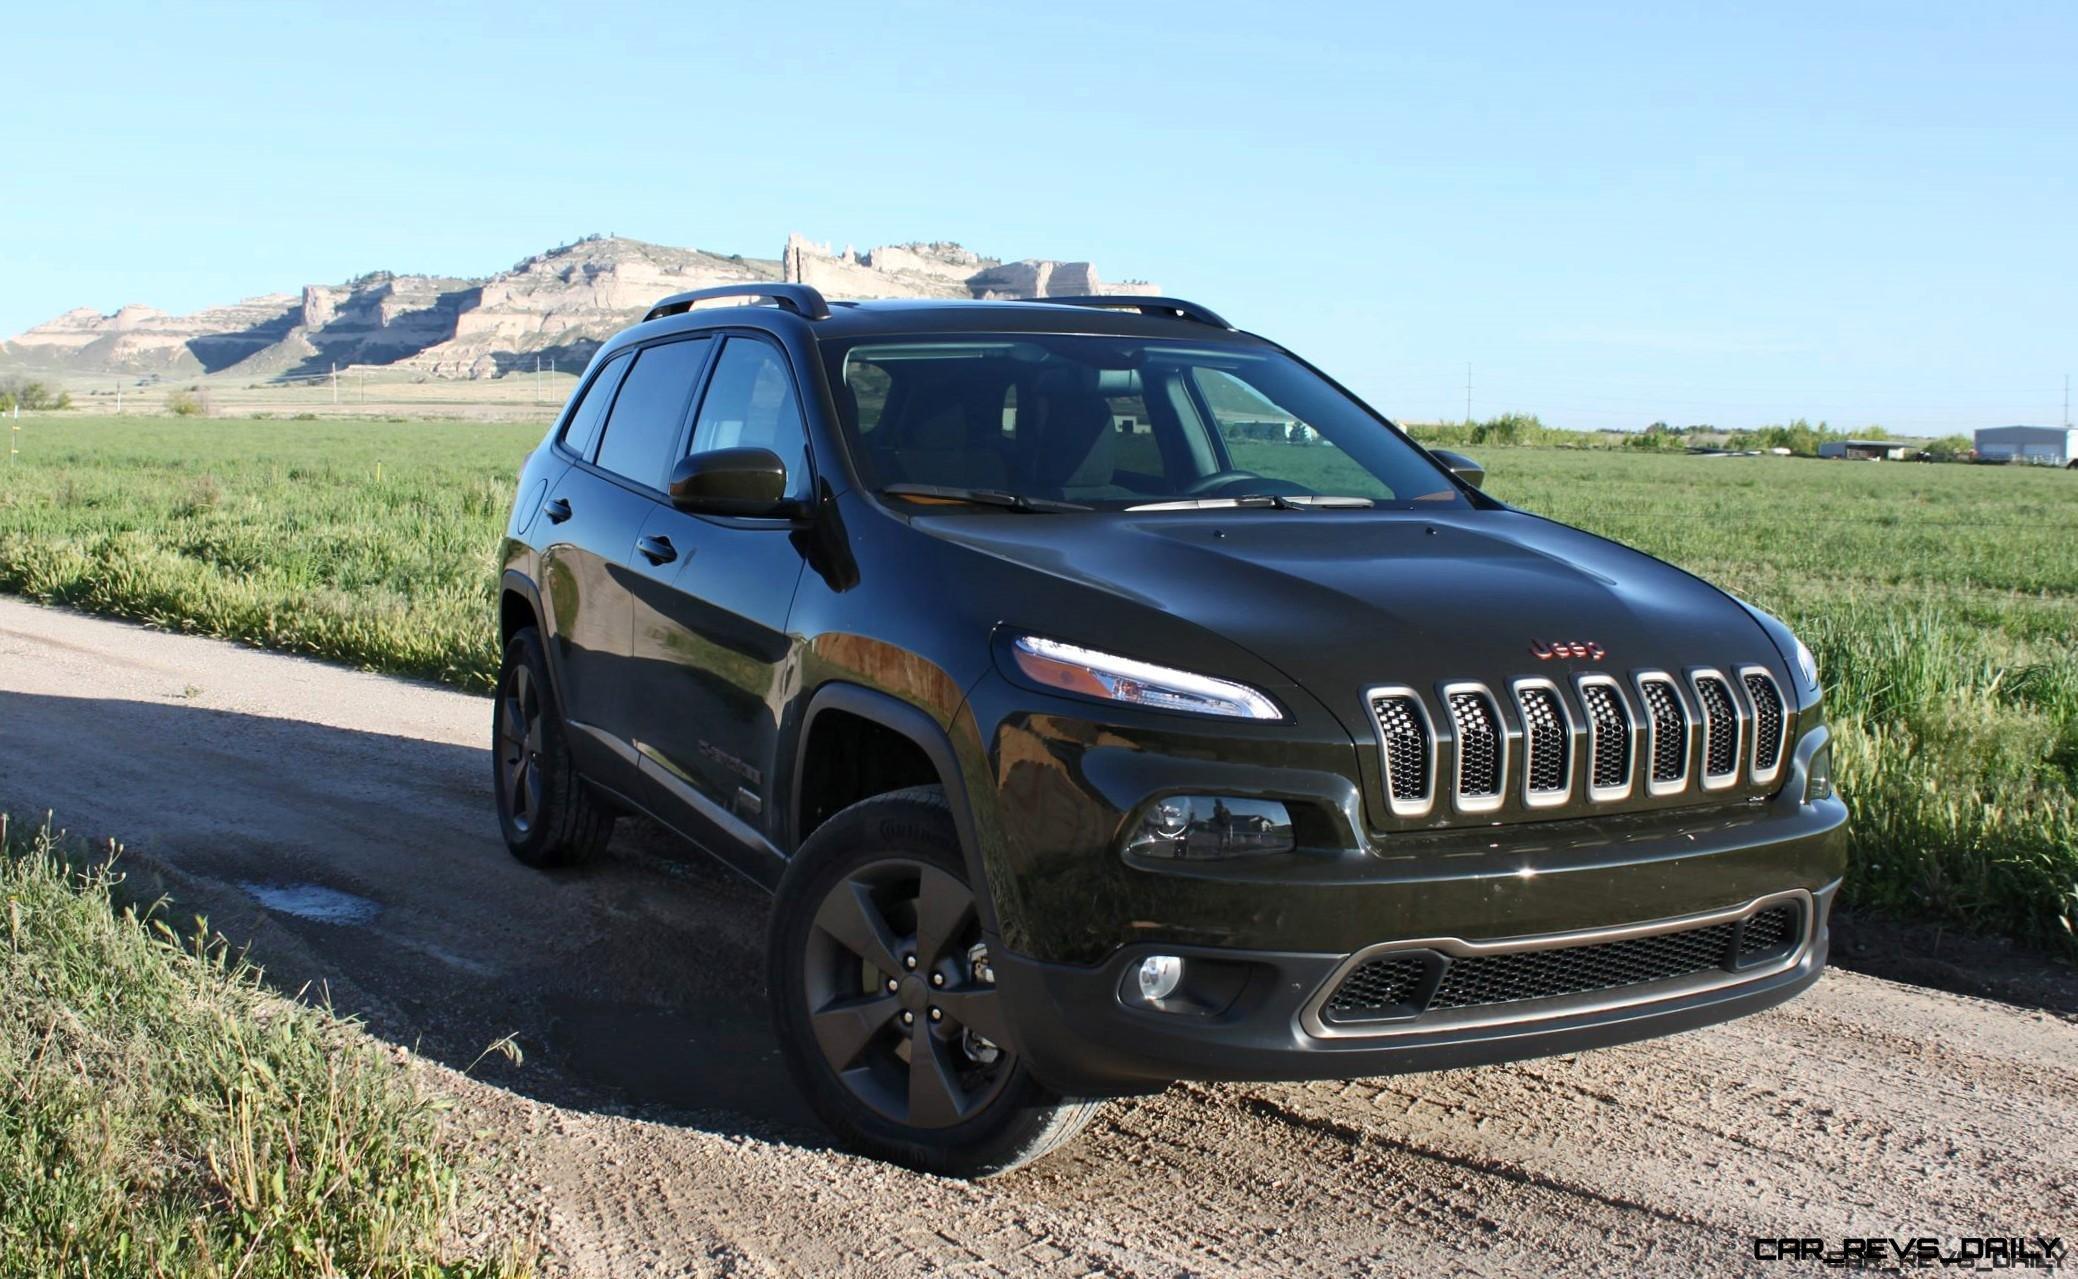 2016 Jeep Cherokee Exterior 4x45 75th Anniversary Edition 6